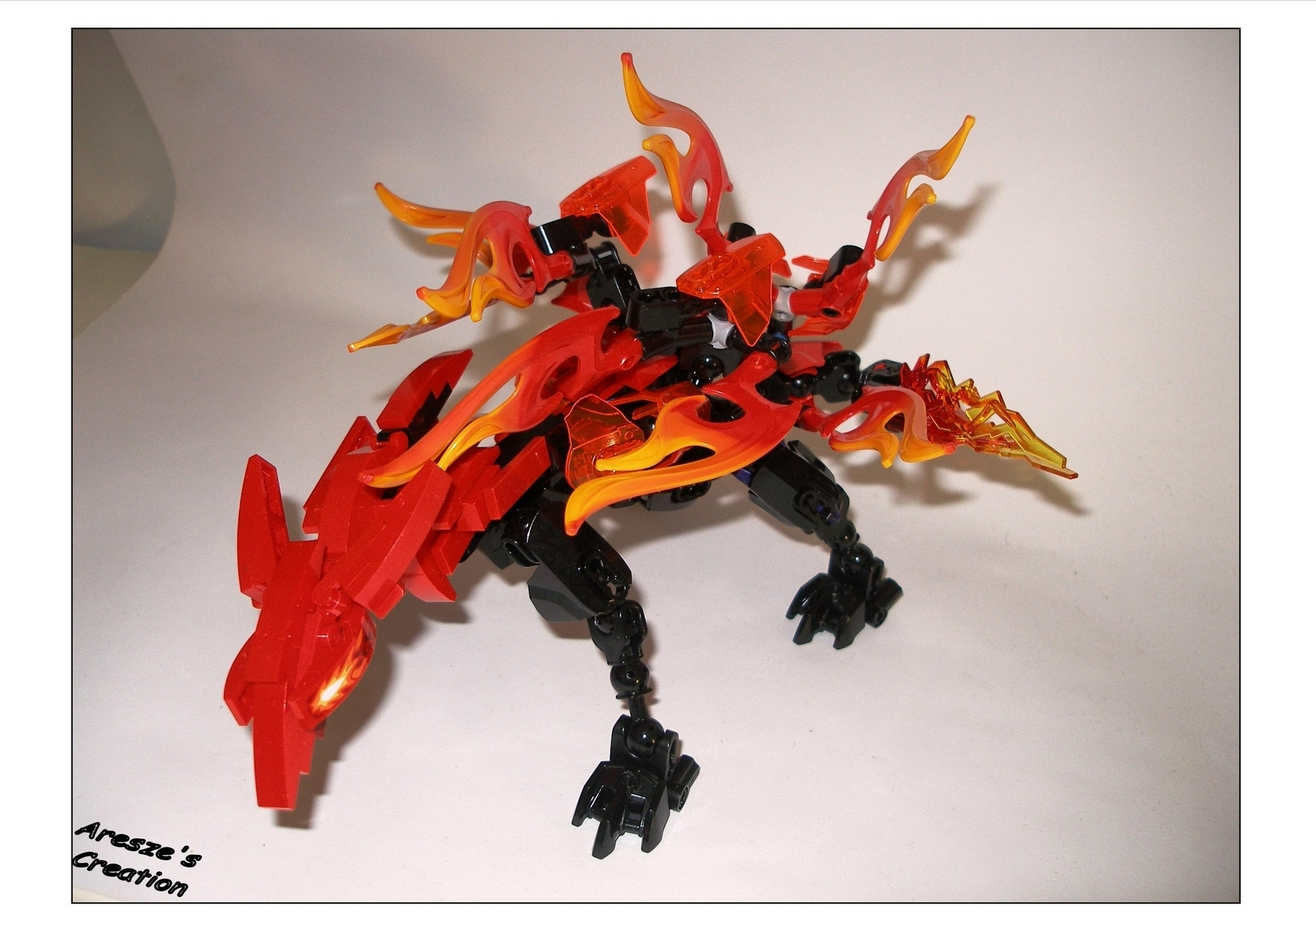 aresze moc - Nine-tailed Fox 017